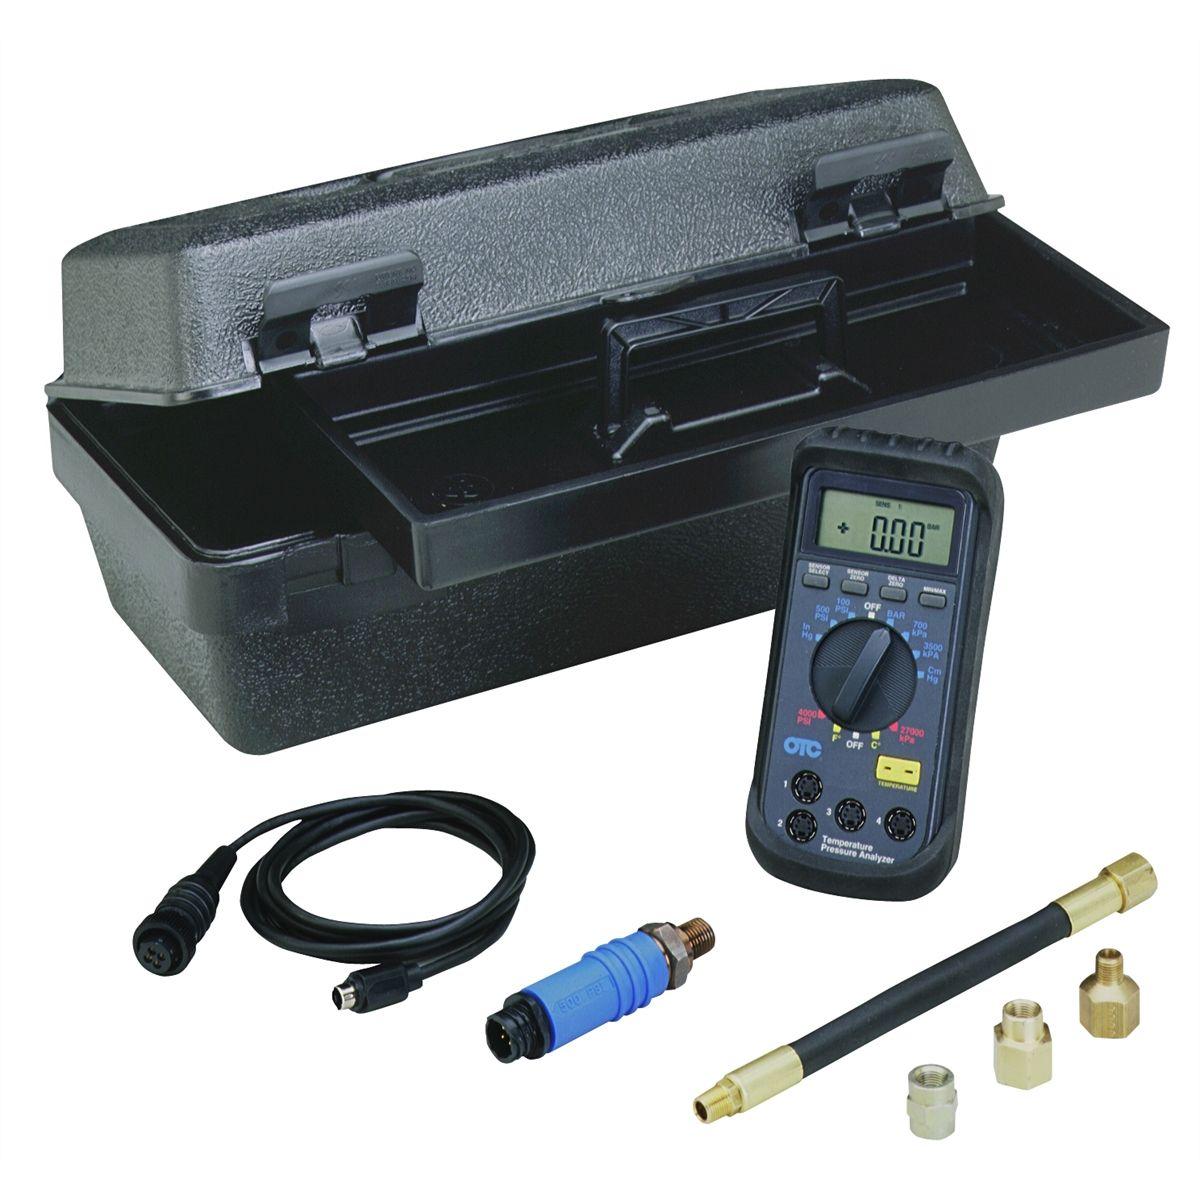 3491-03 OTC 10,000 PSI Transducer